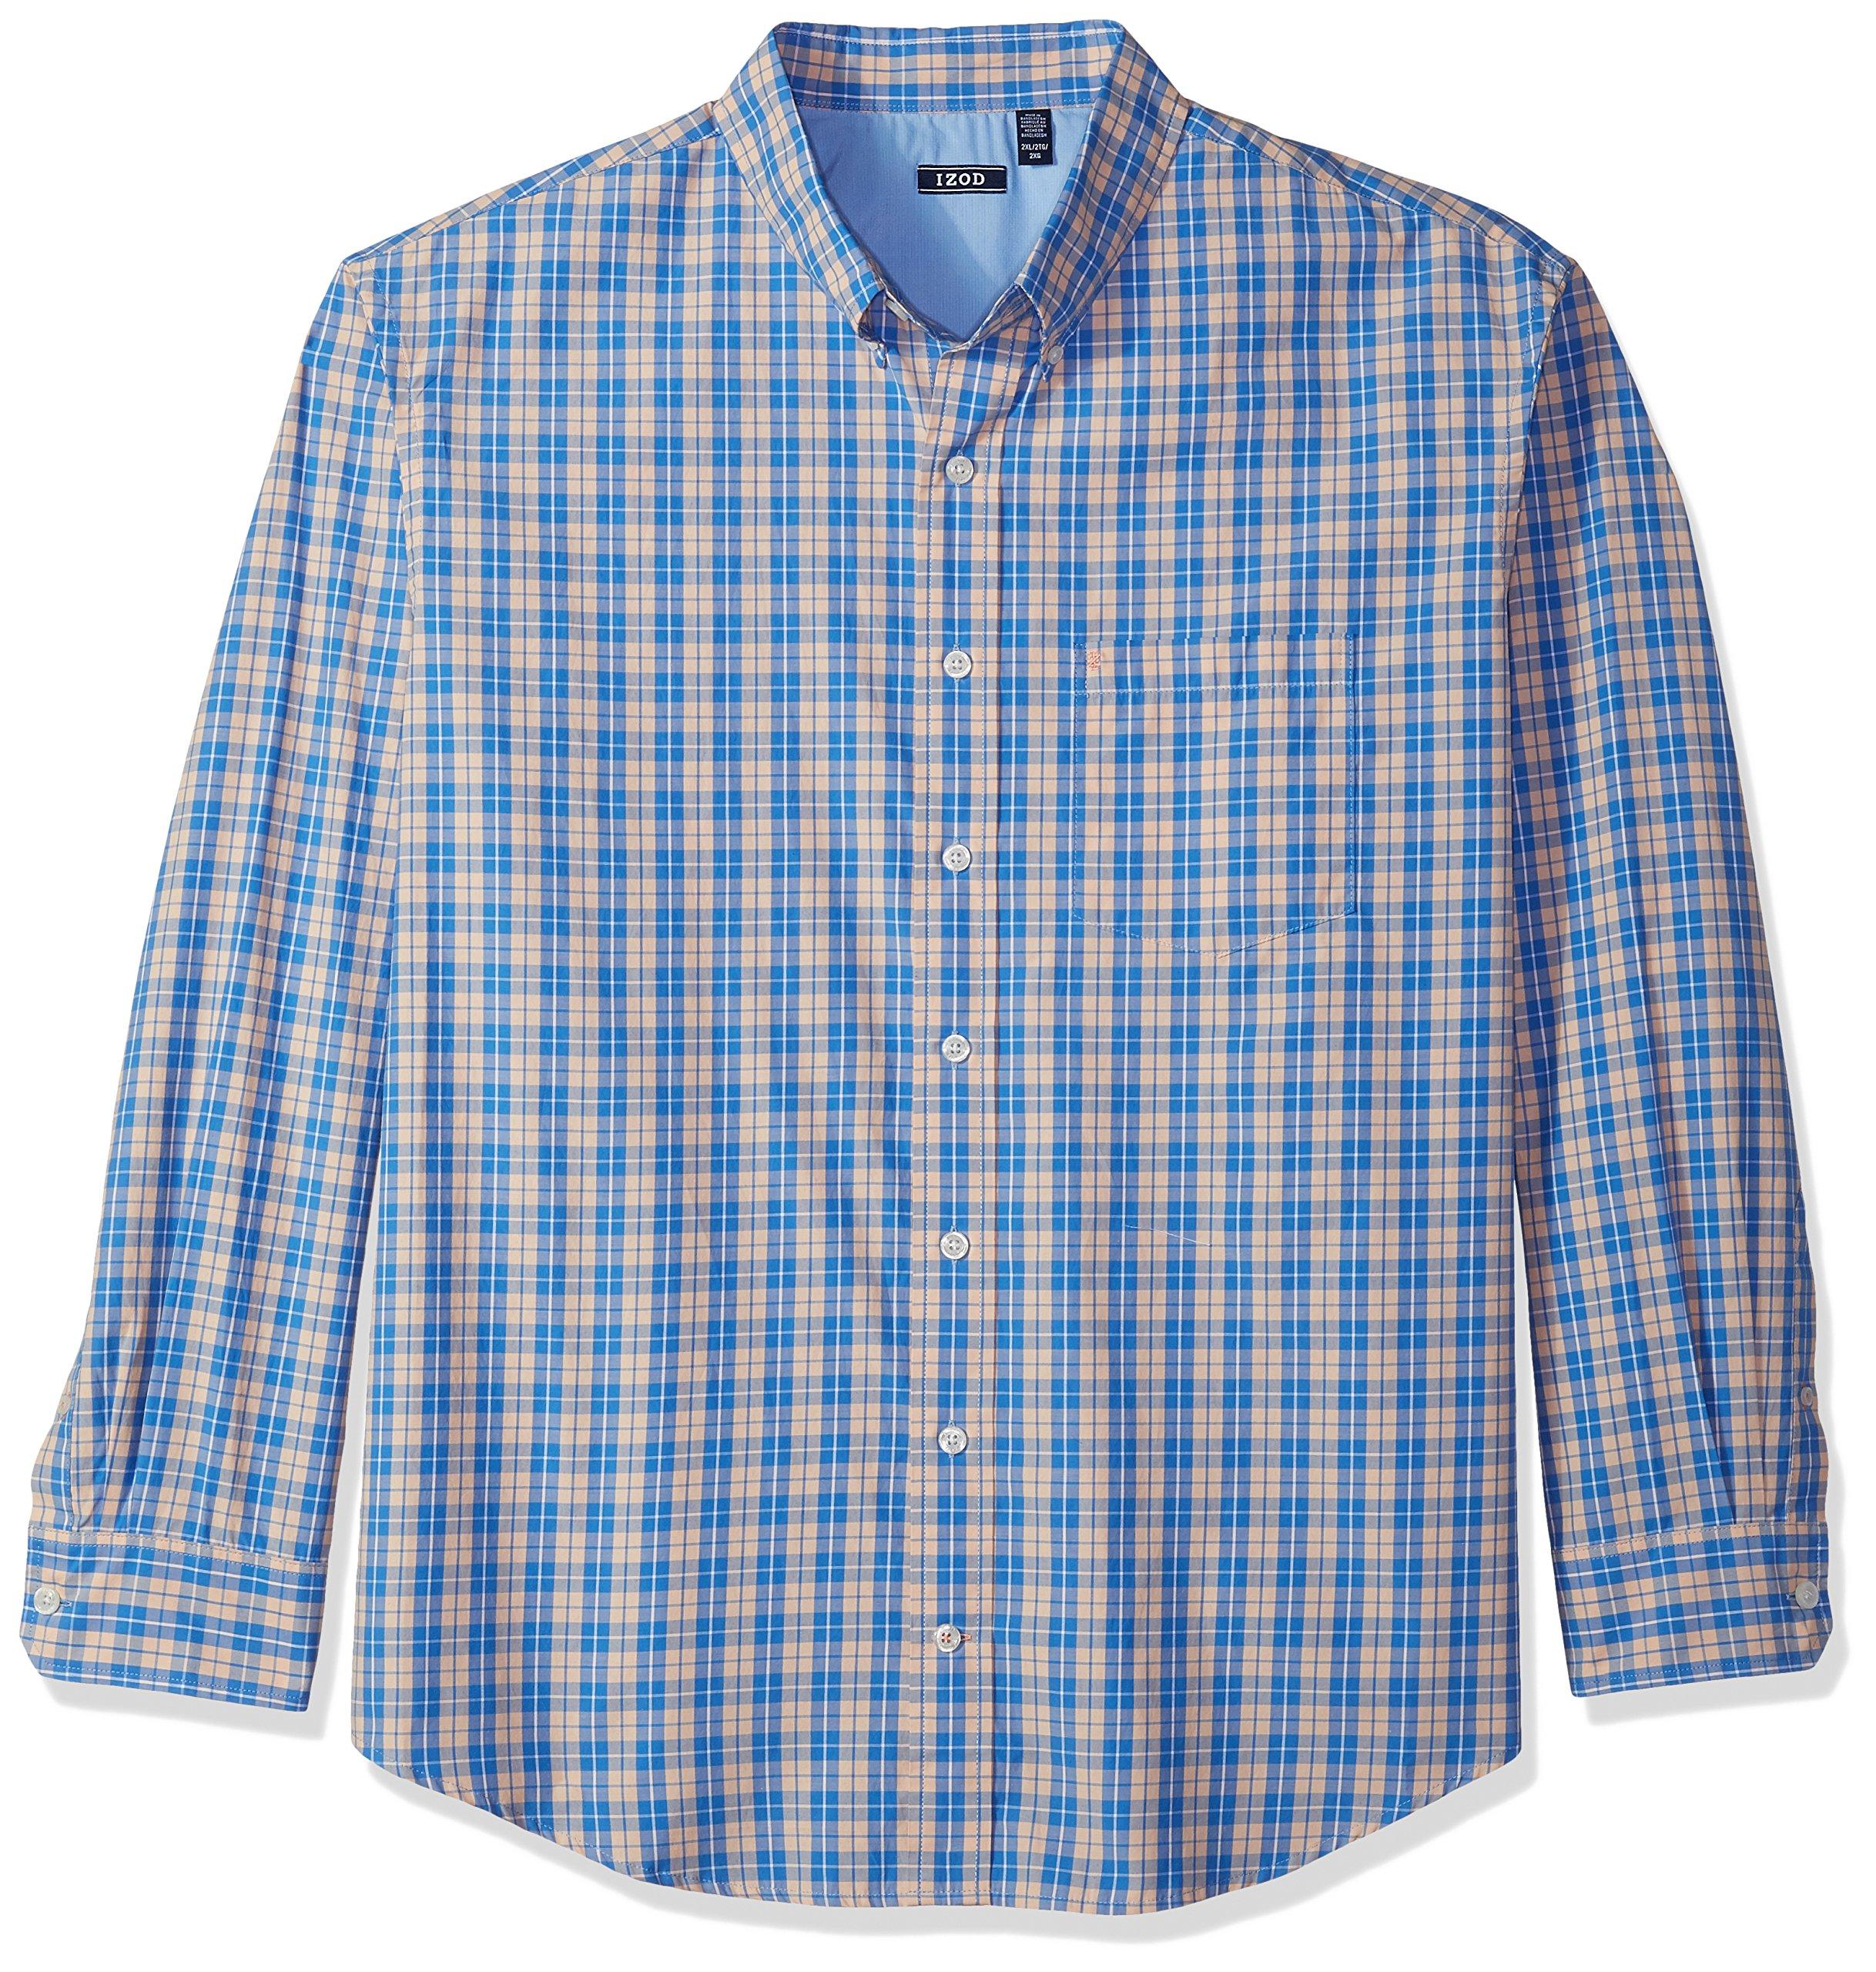 IZOD Men's Big and Tall Saltwater Breeze Plaid Long Sleeve Shirt, Peach Parfait, 3X-Large